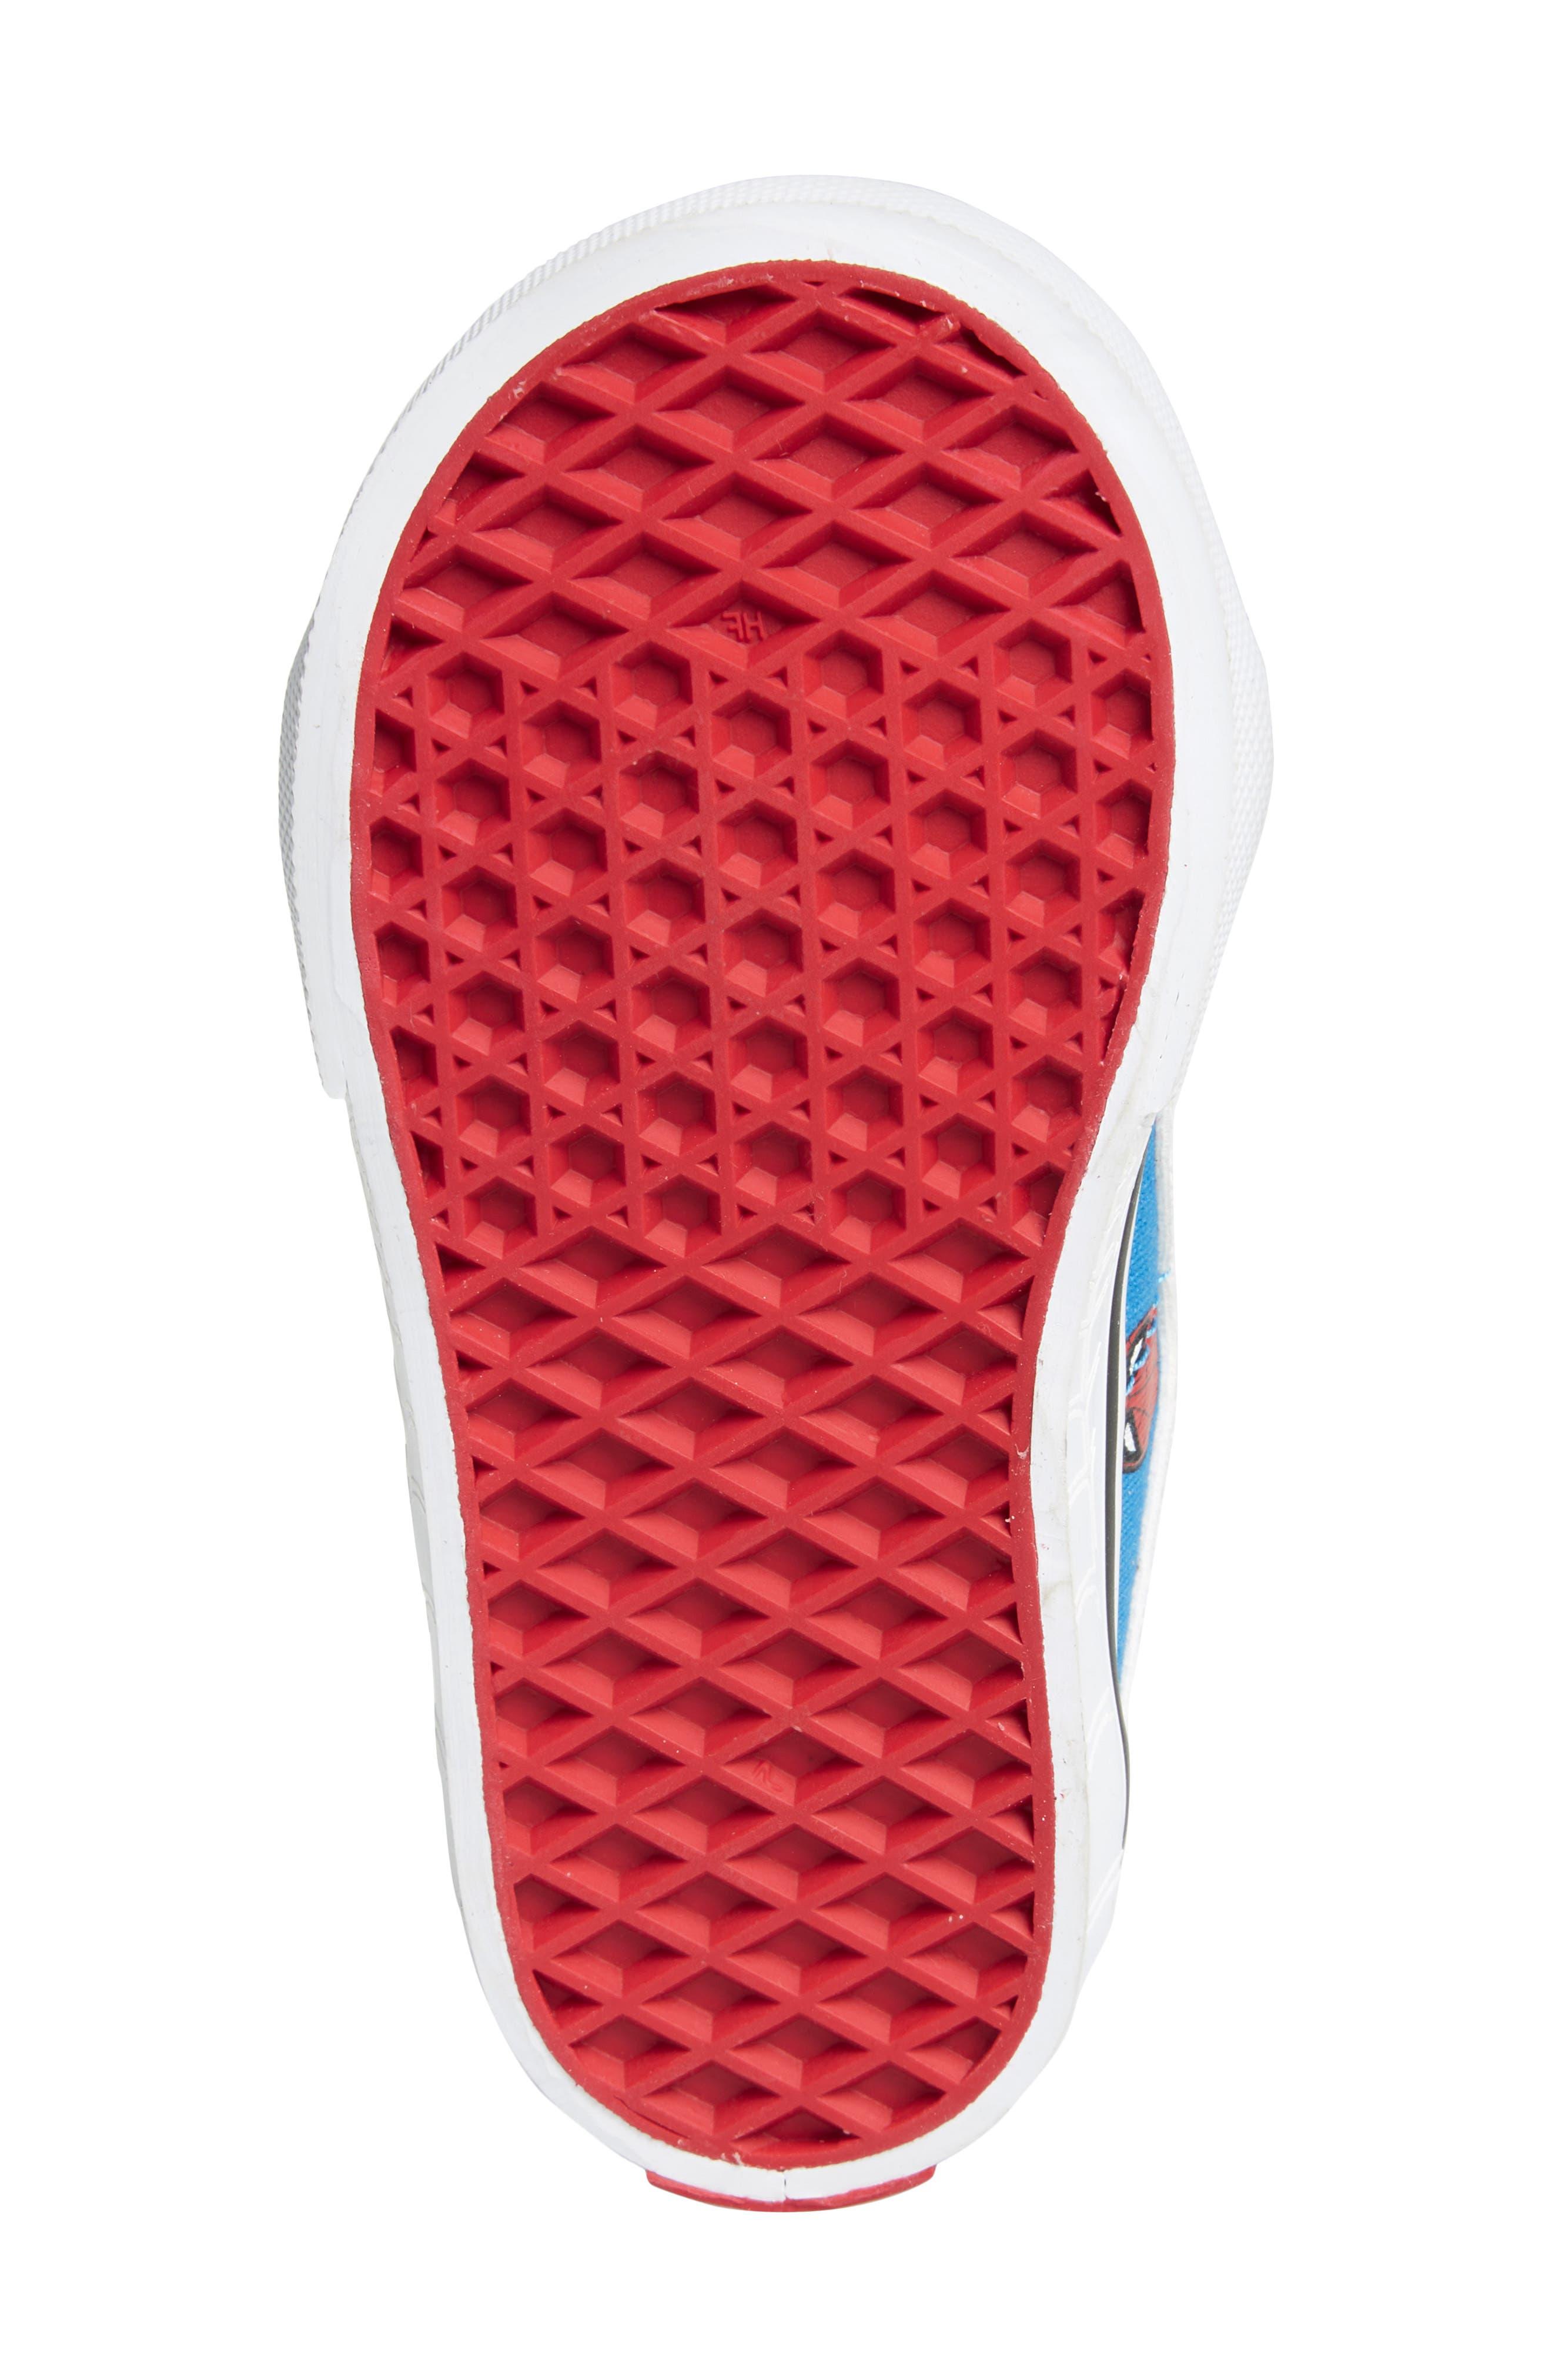 x Marvel<sup>®</sup> Spider-Man SK8-Hi Sneaker,                             Alternate thumbnail 6, color,                             610